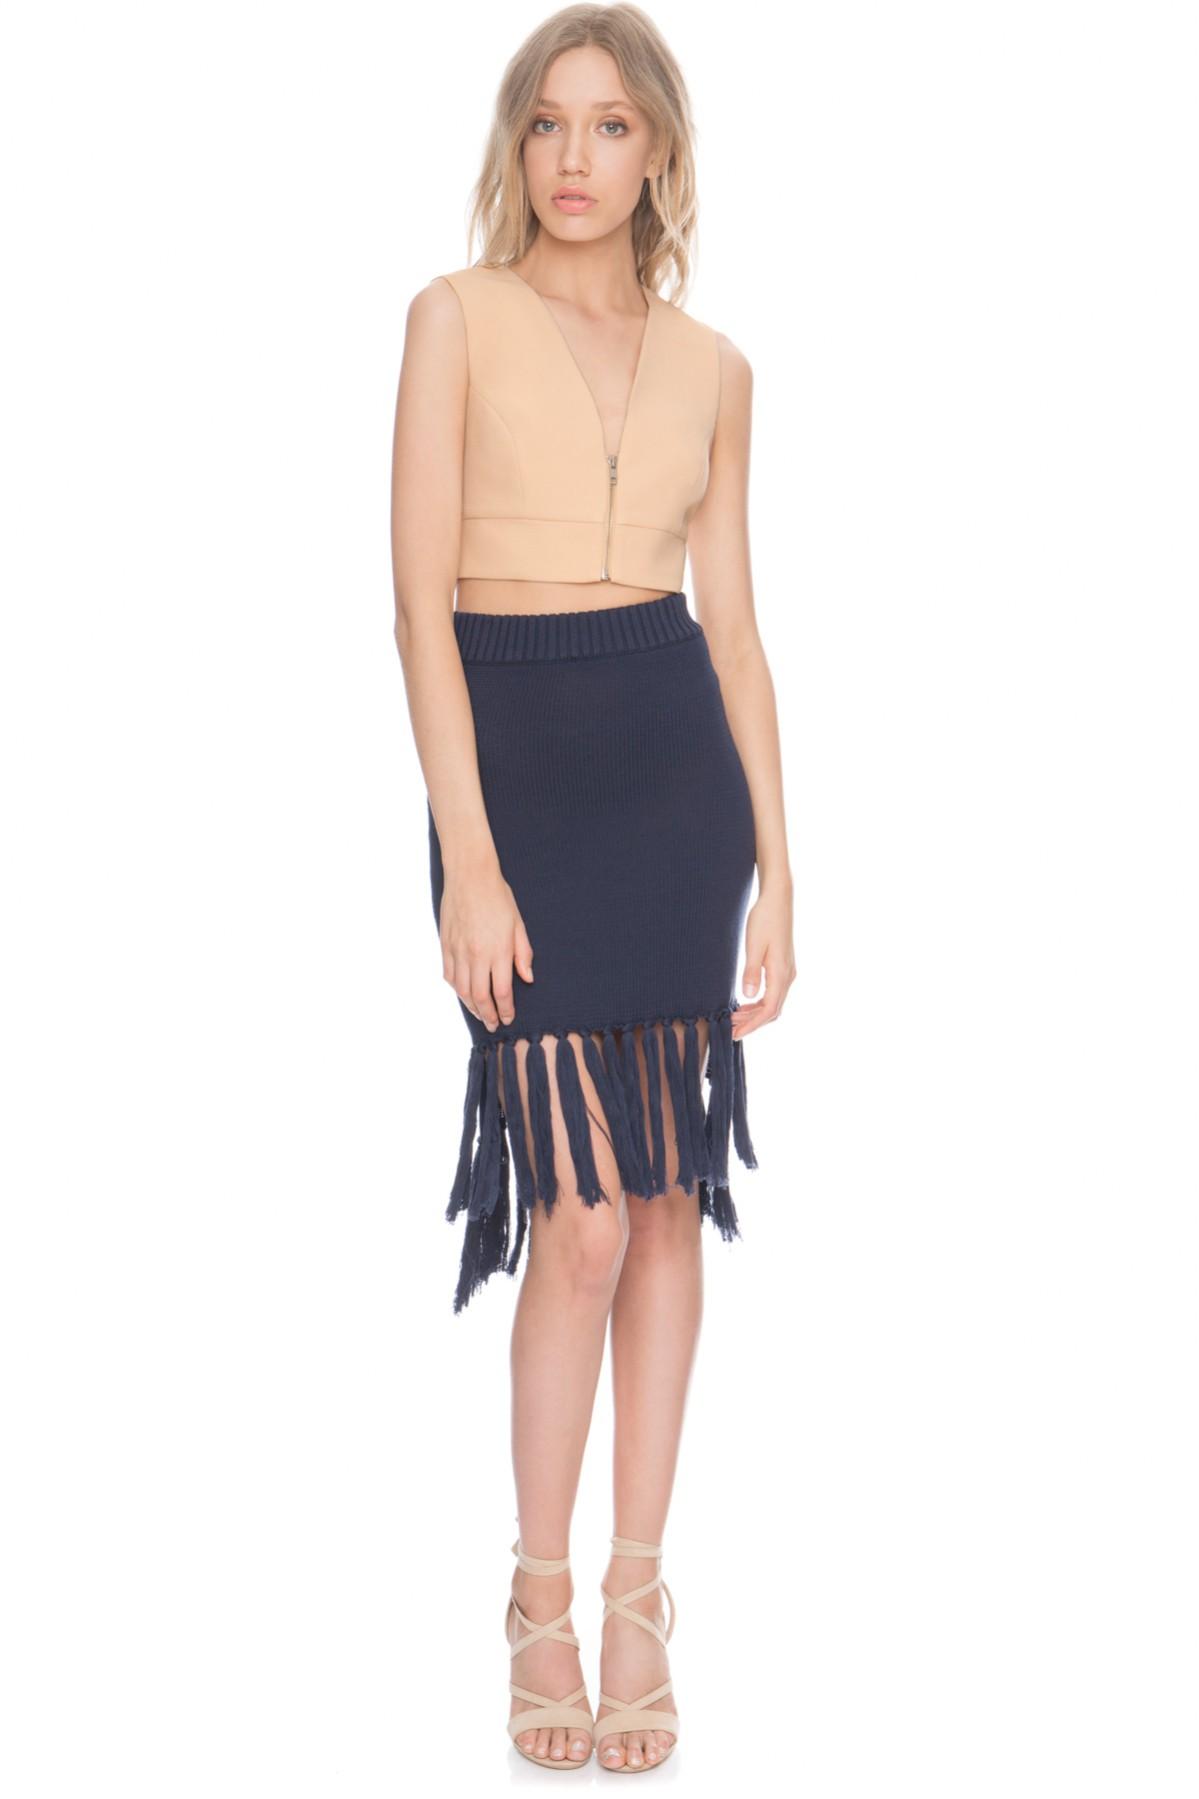 Shop Finders Graduates Skirt.